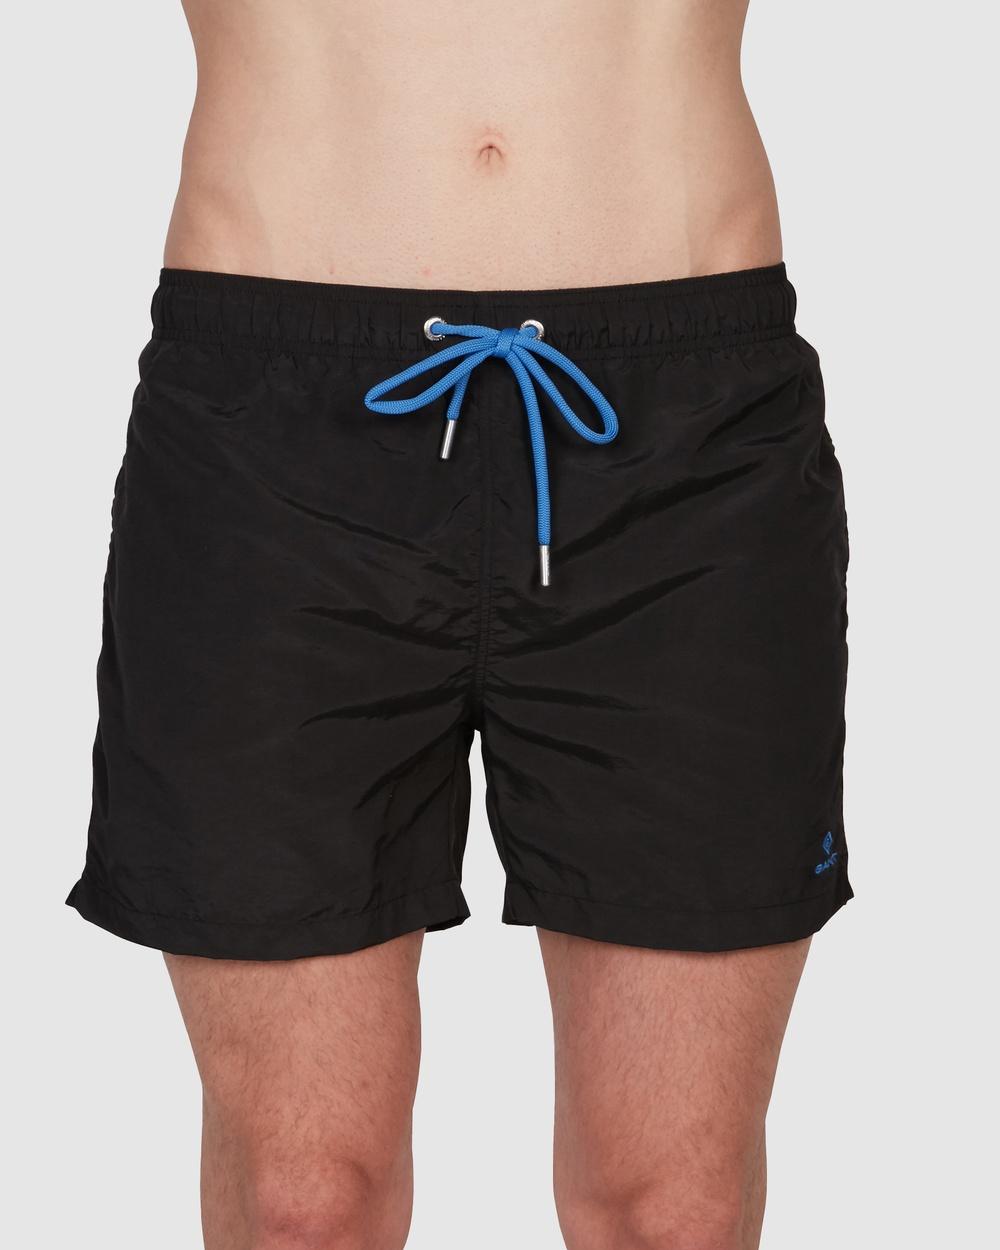 Gant Classic Fit Swim Shorts Briefs BLACK